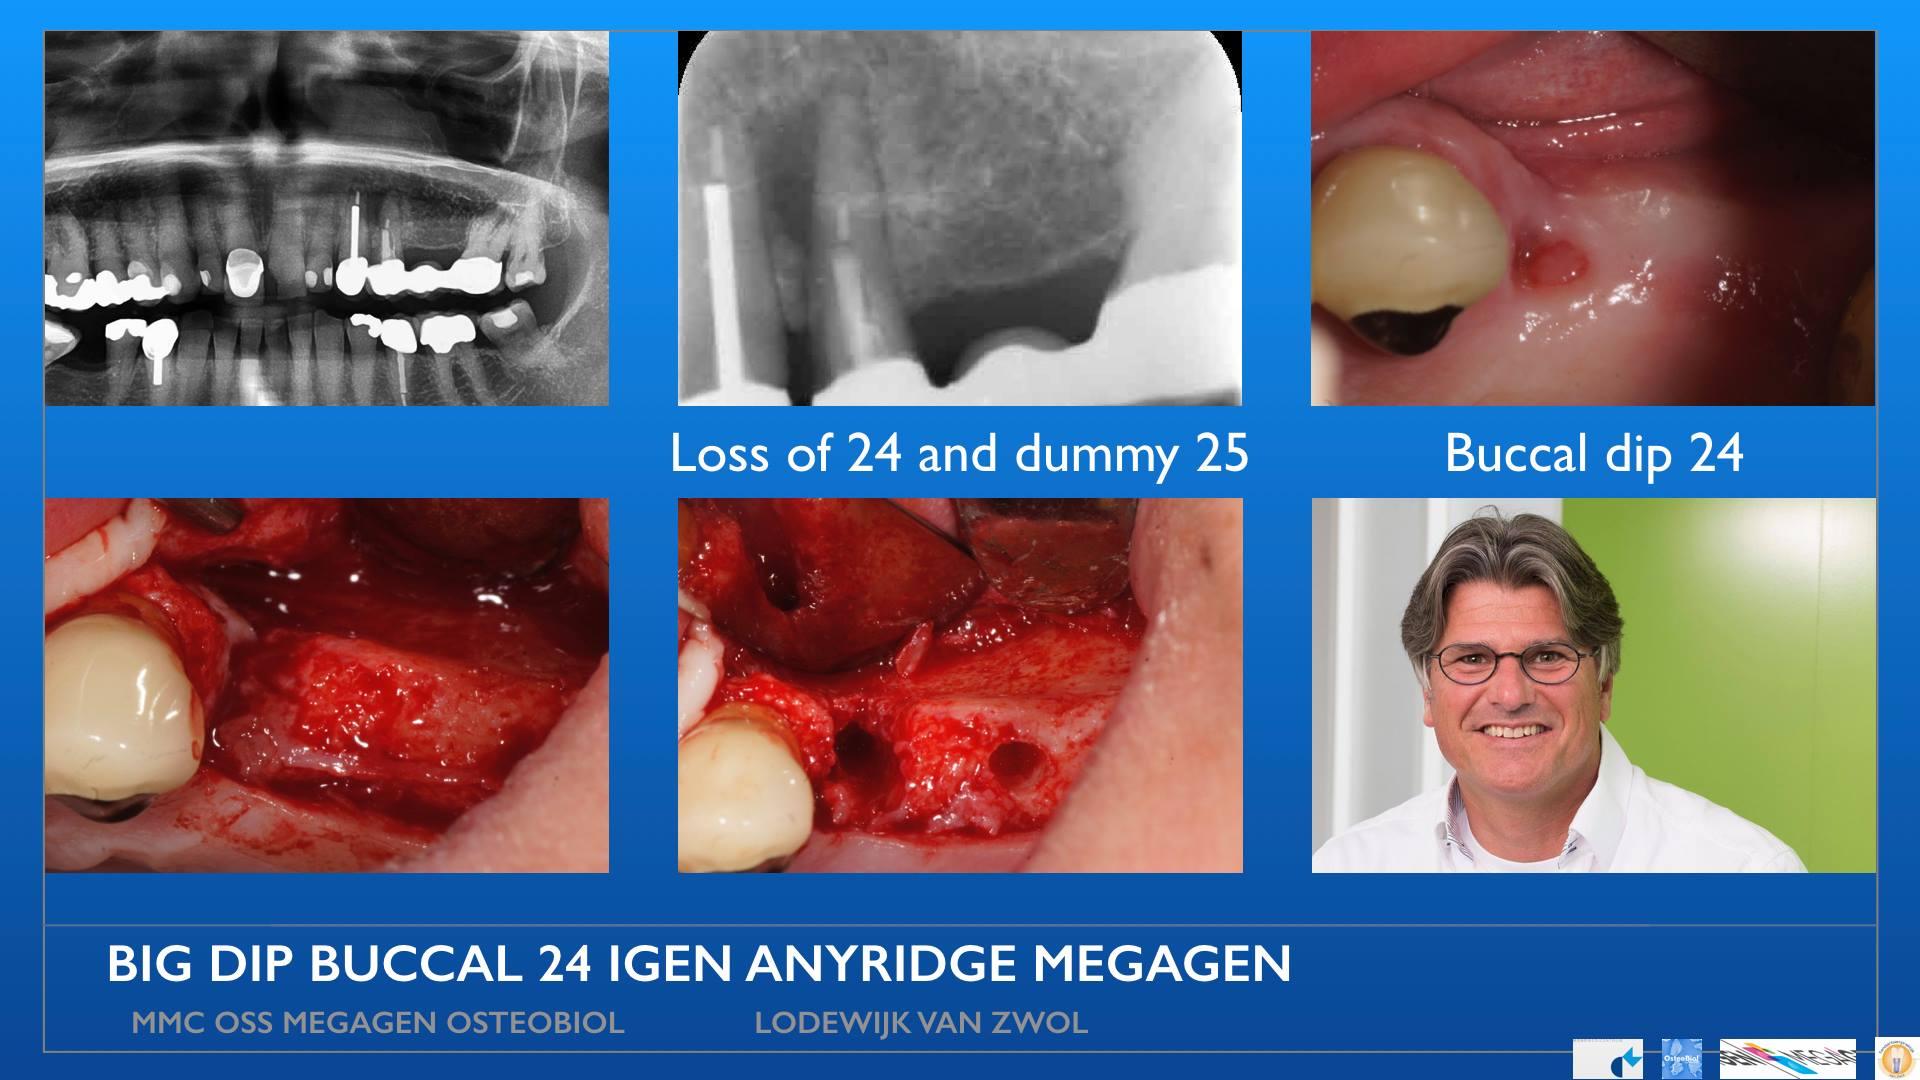 MegaGen AnyRidge with IGen icw OsteoBiol GenOs and Evolution